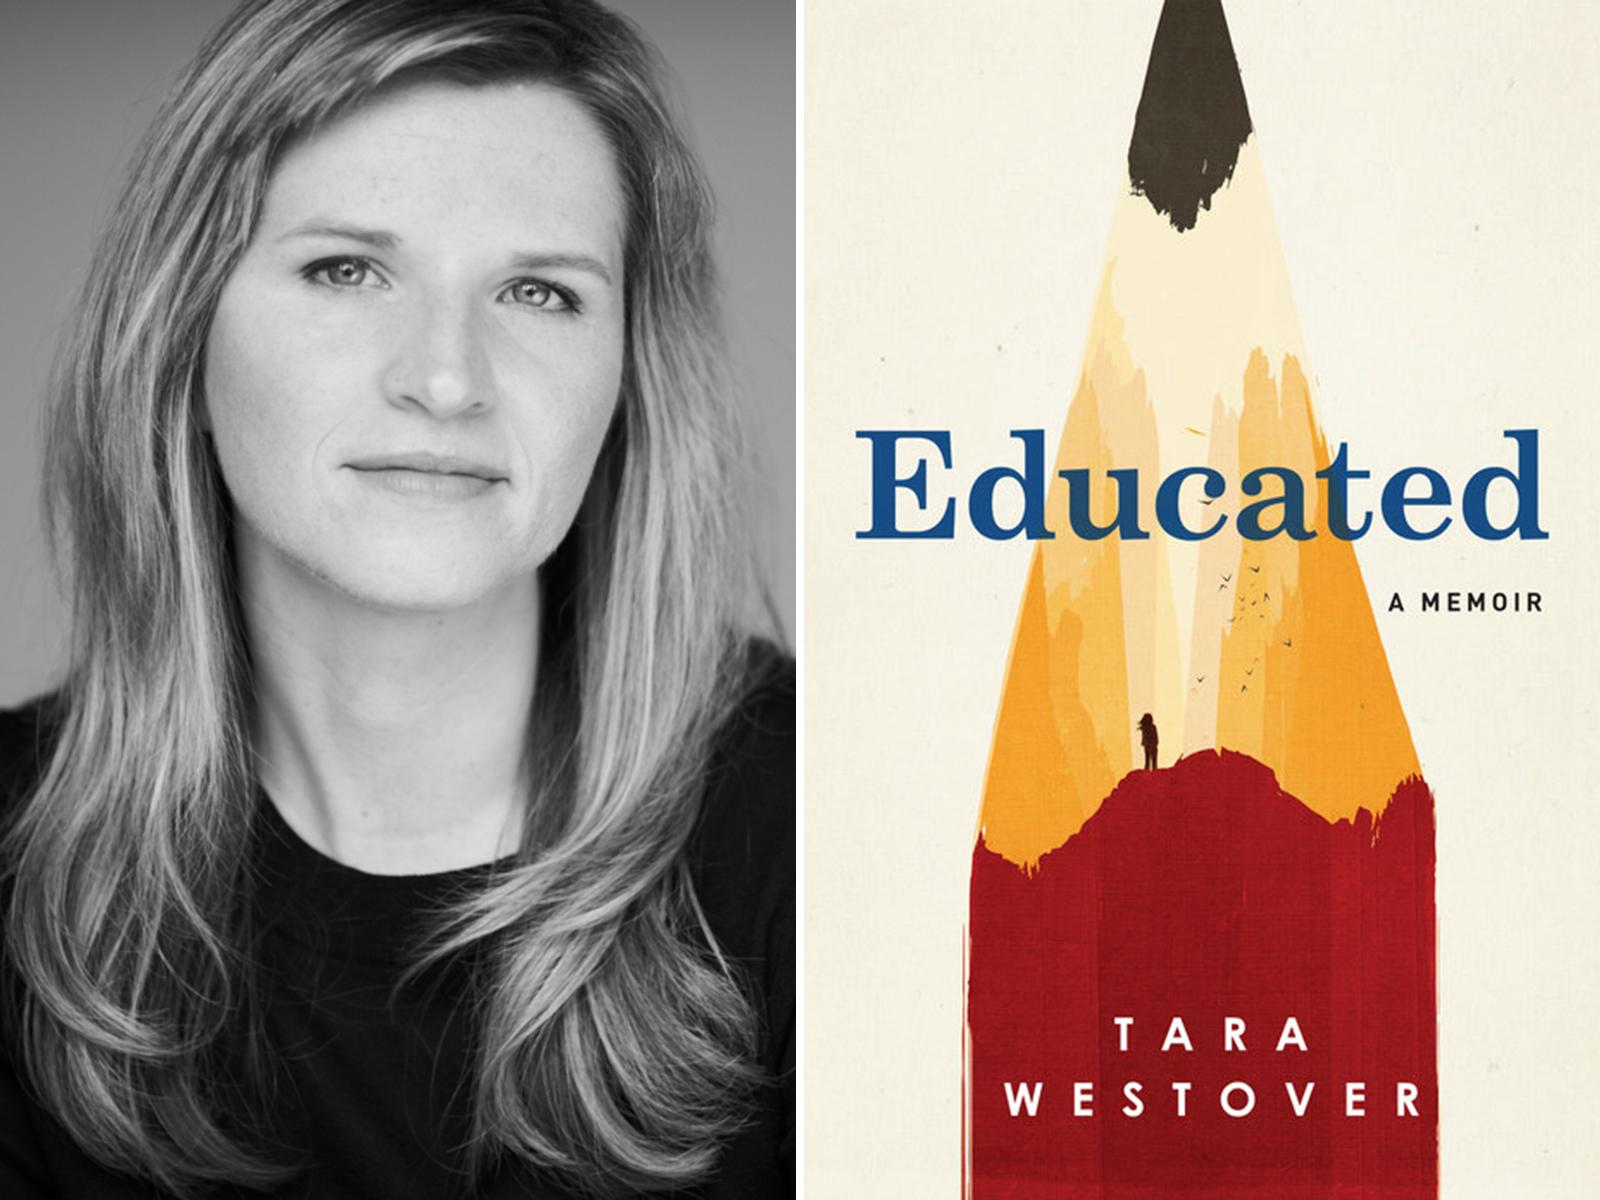 Book Pick: Educated by Tara Westover